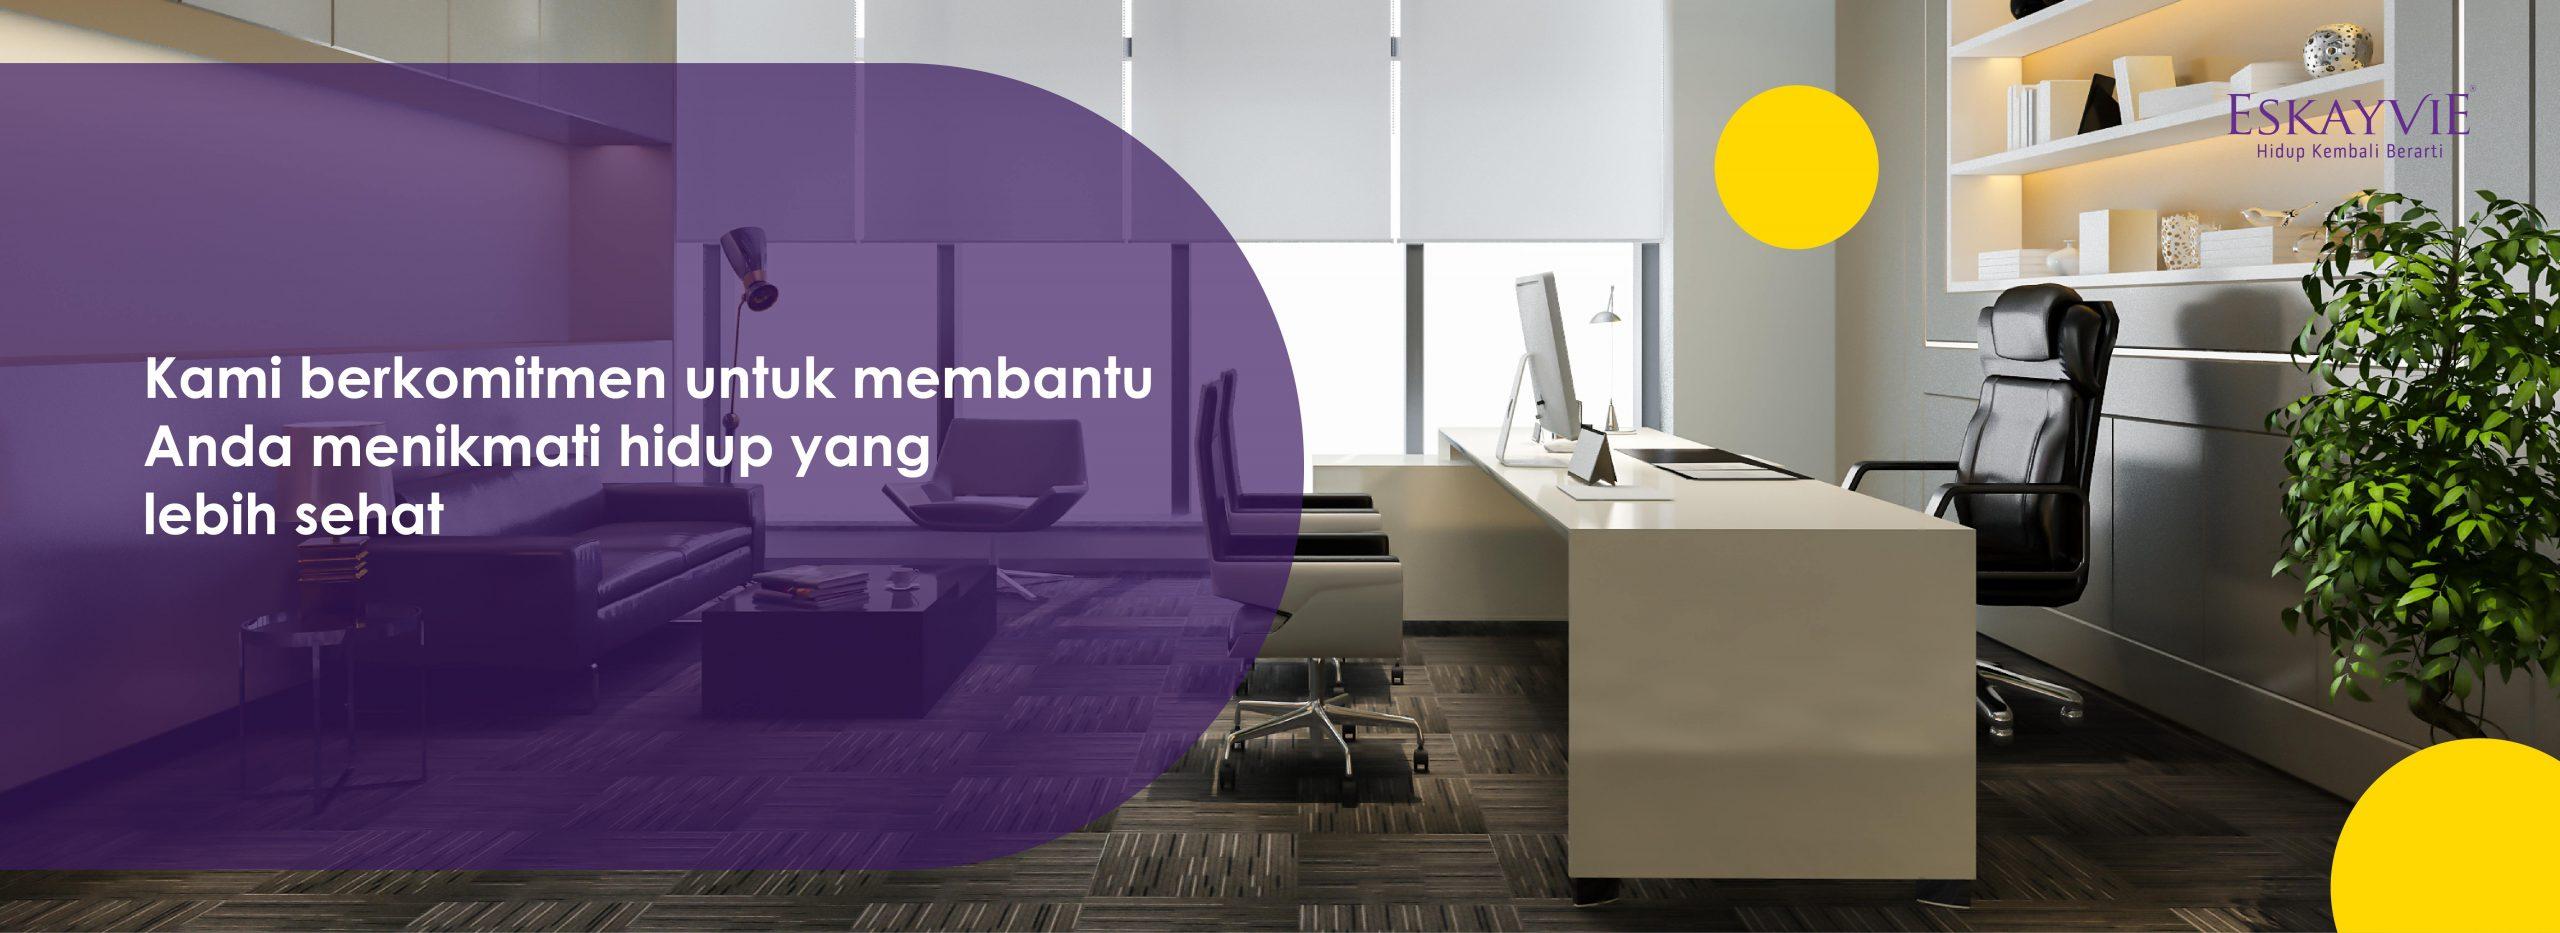 banner profil perusahaan eskayvie indonesia